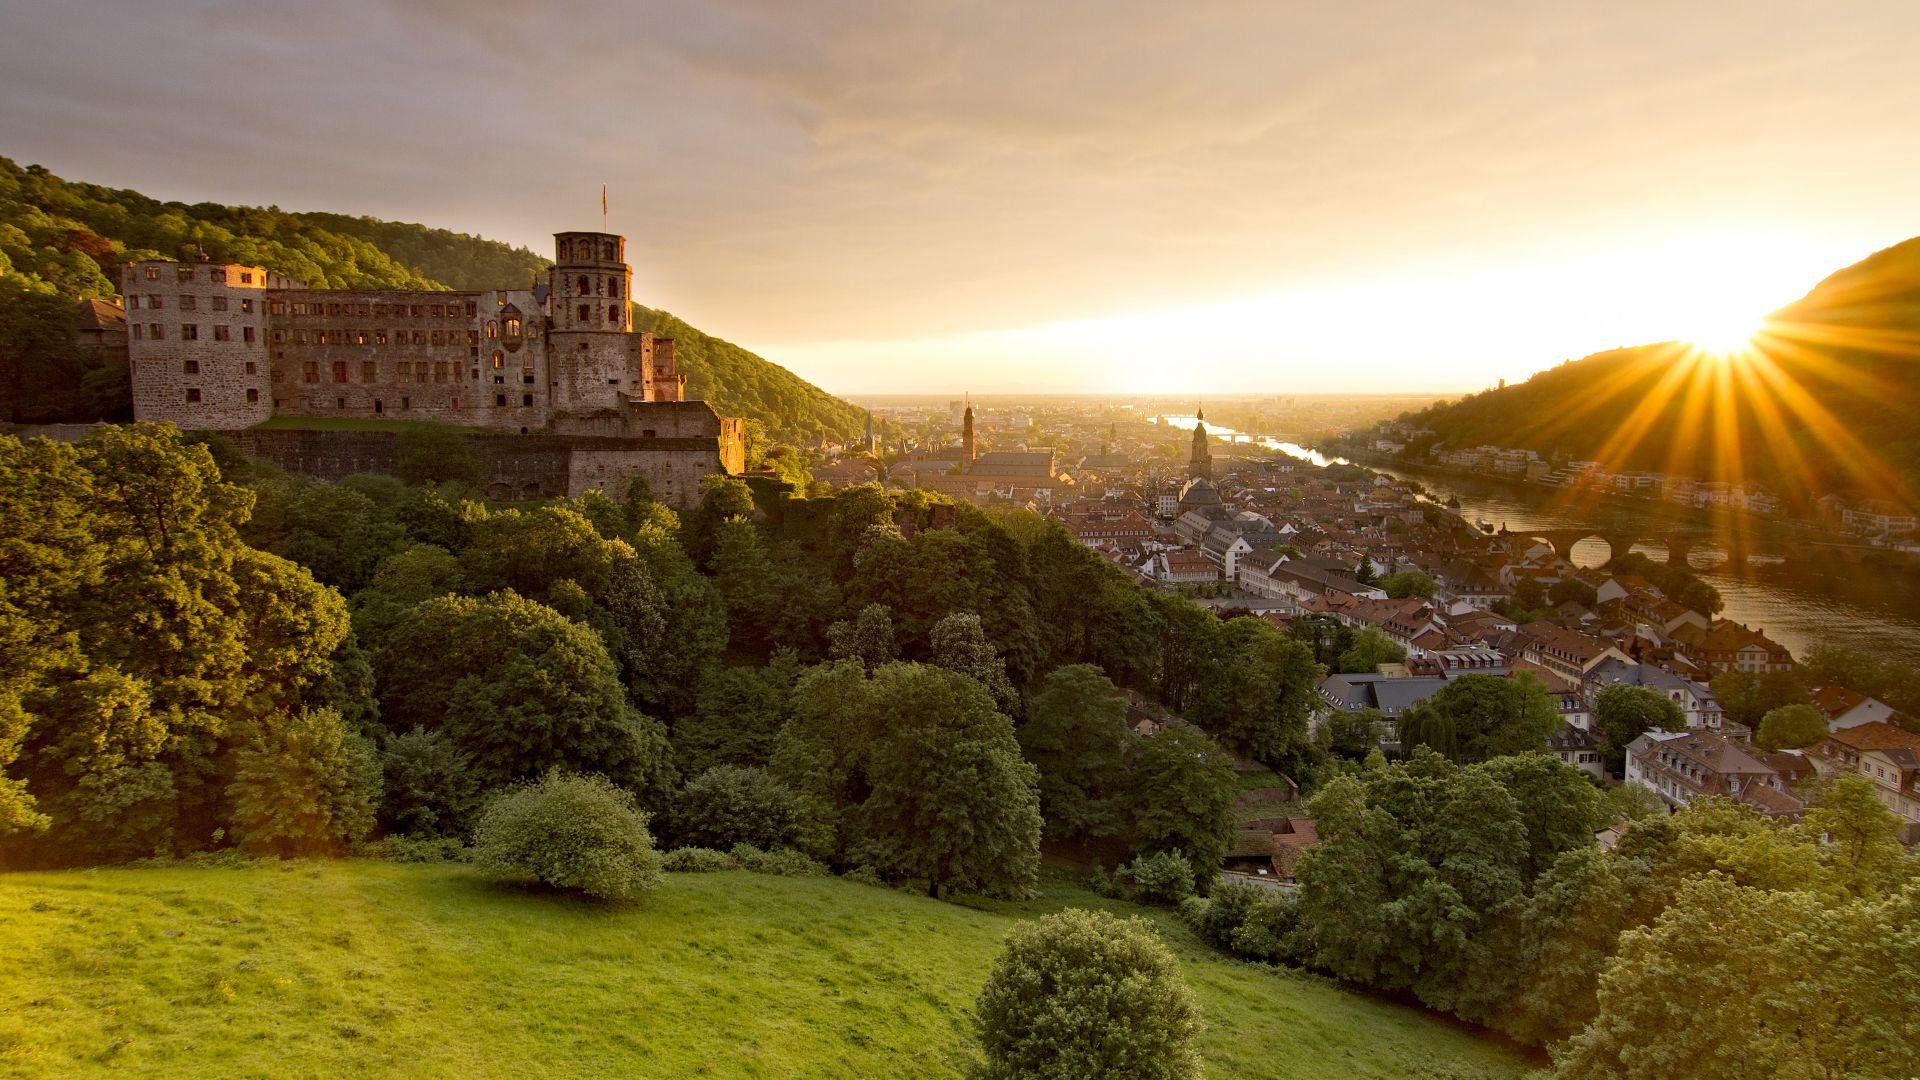 Heidelberg: The castle overlooks the city and the Neckar valley, sunset